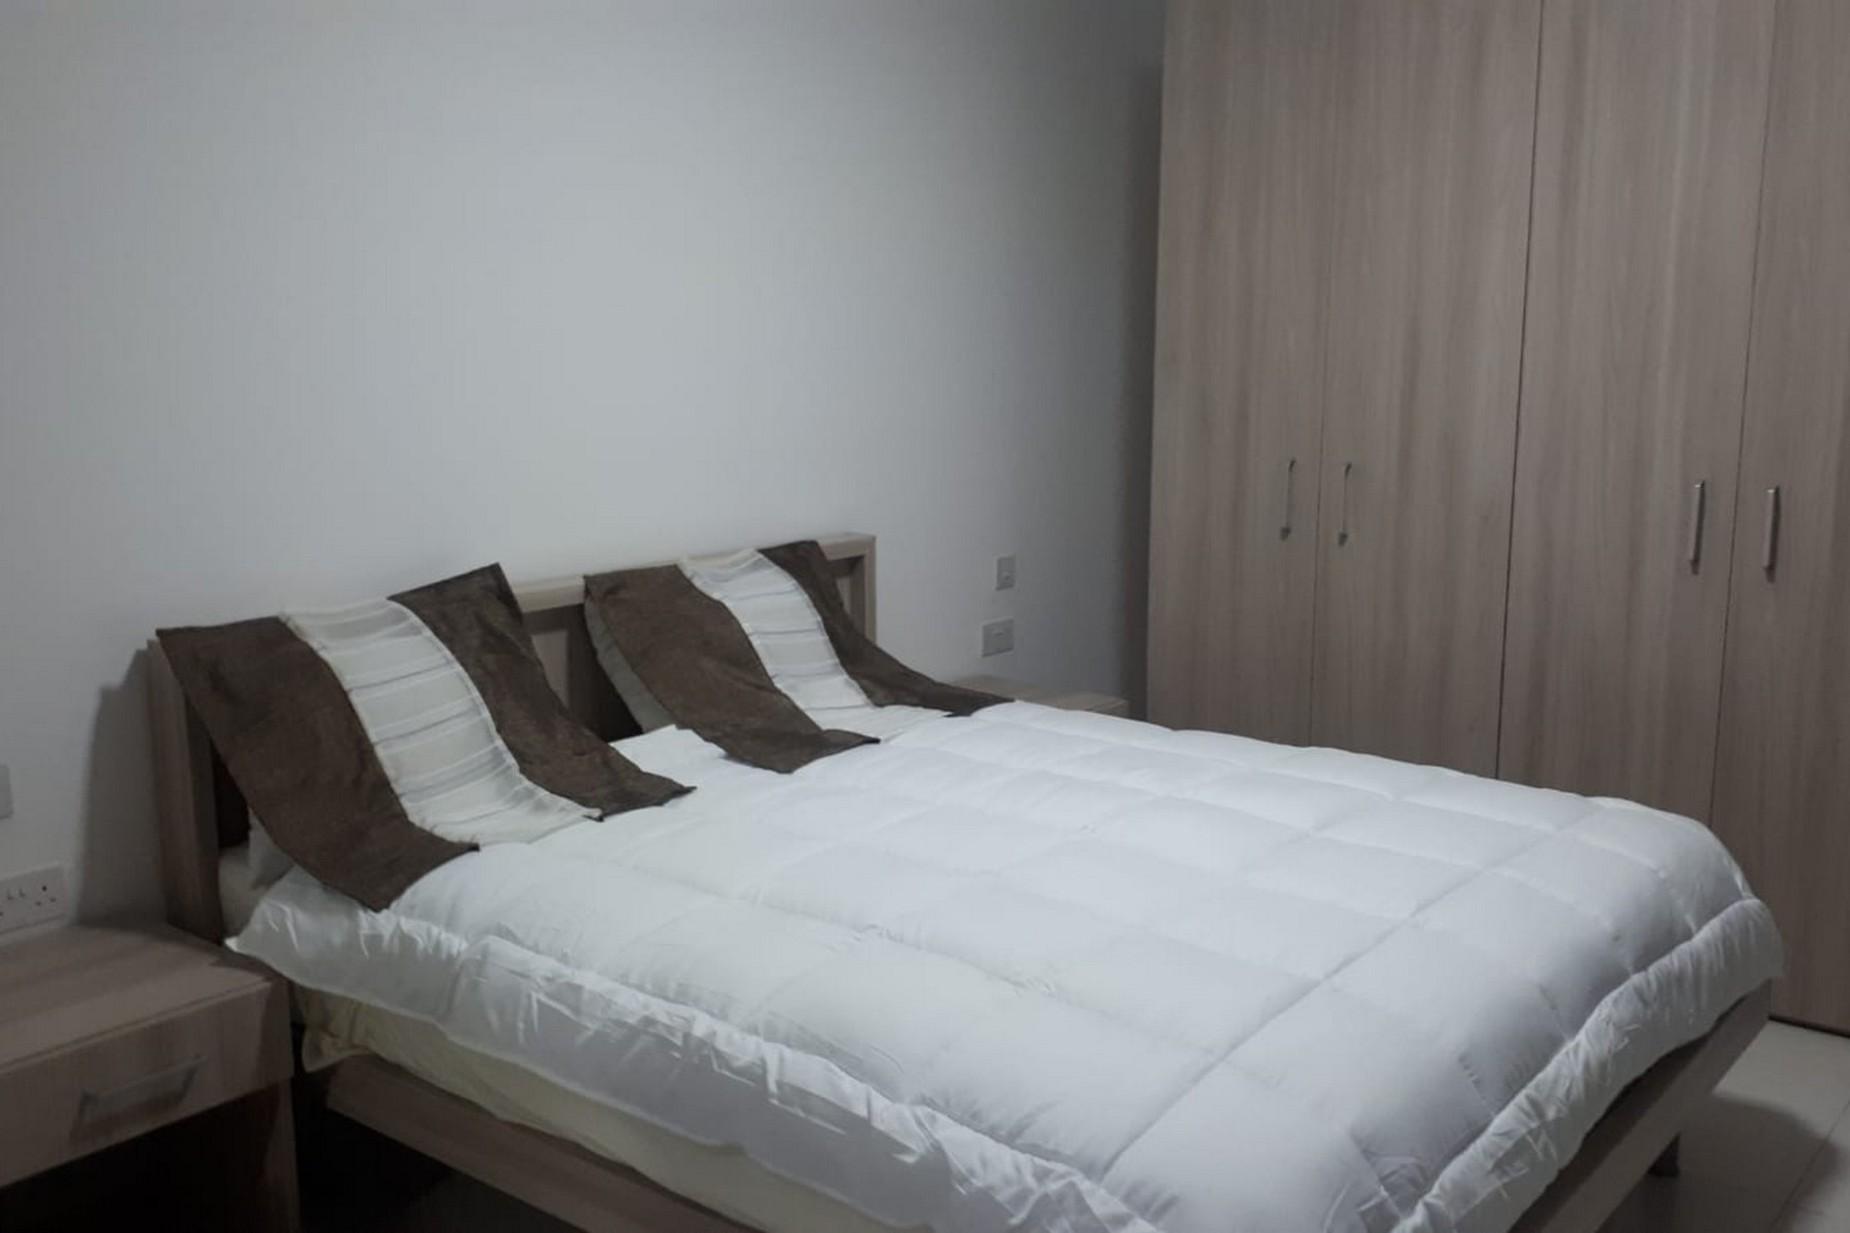 3 bed Apartment For Rent in Rabat, Rabat - thumb 5